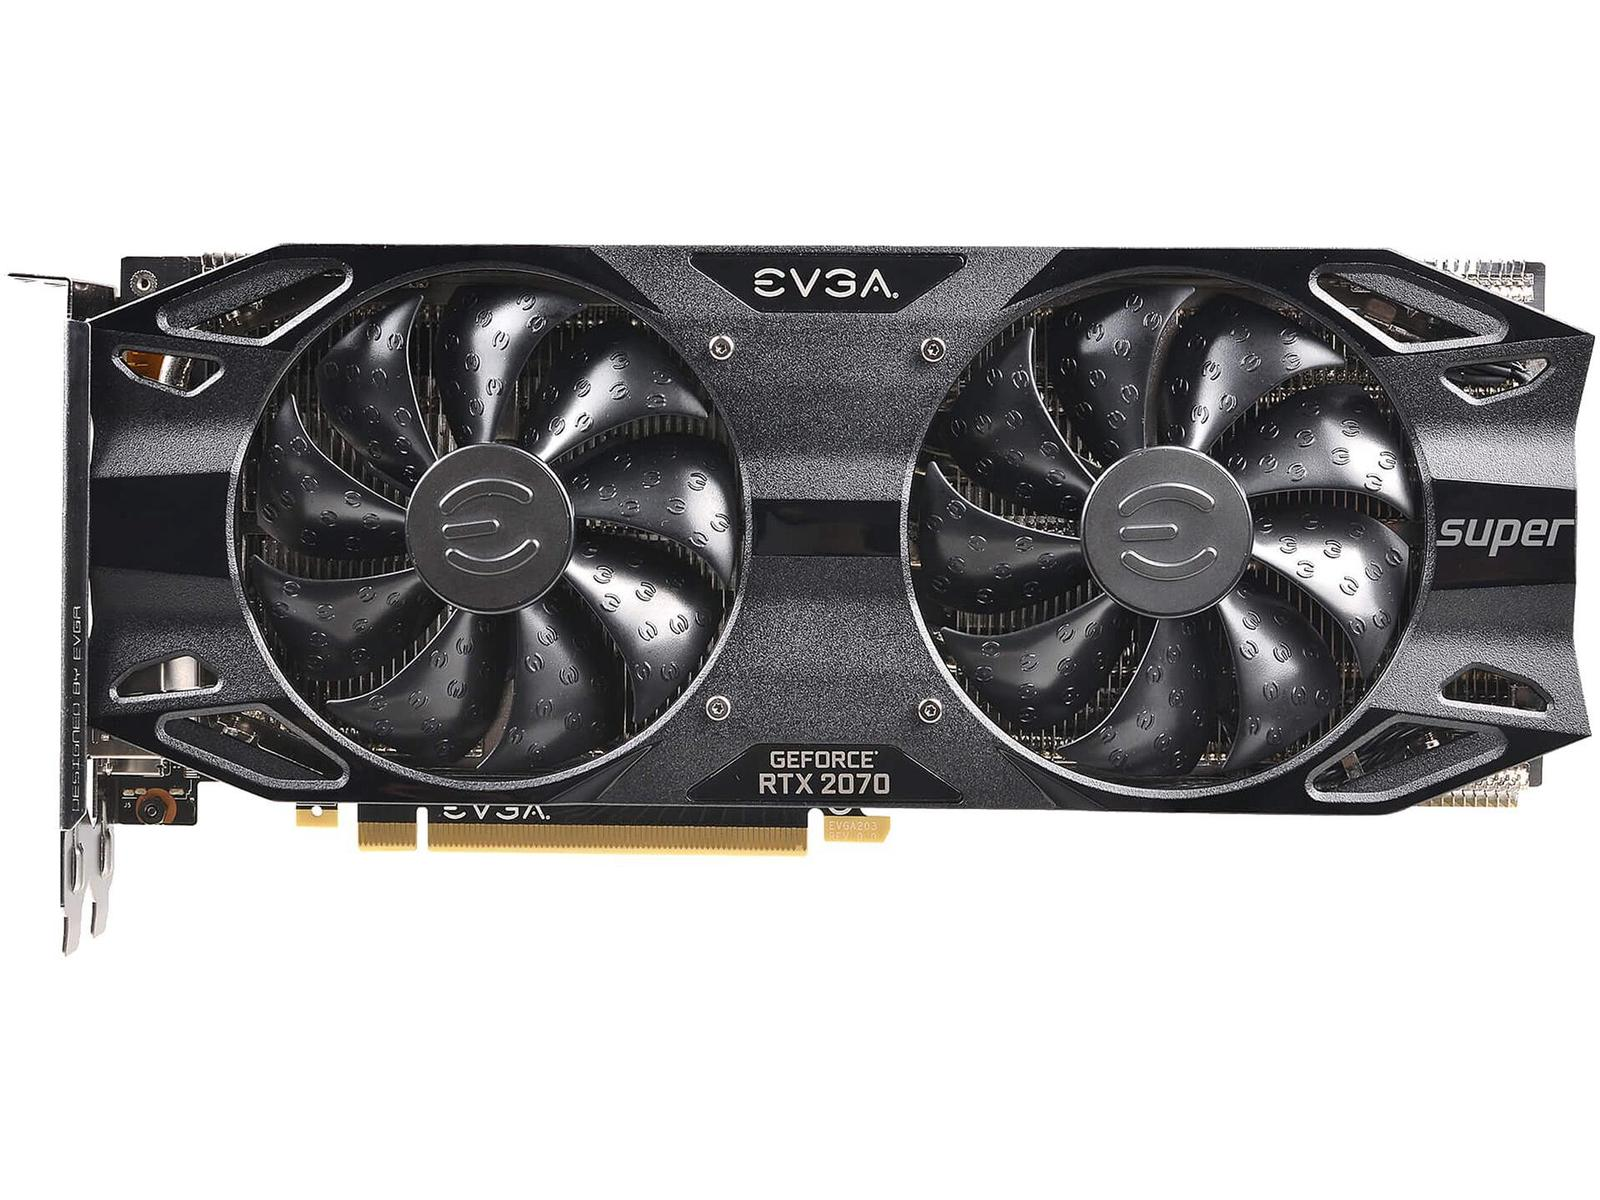 EVGA GeForce RTX 2070 SUPER 8 GB BLACK GAMING Video Card